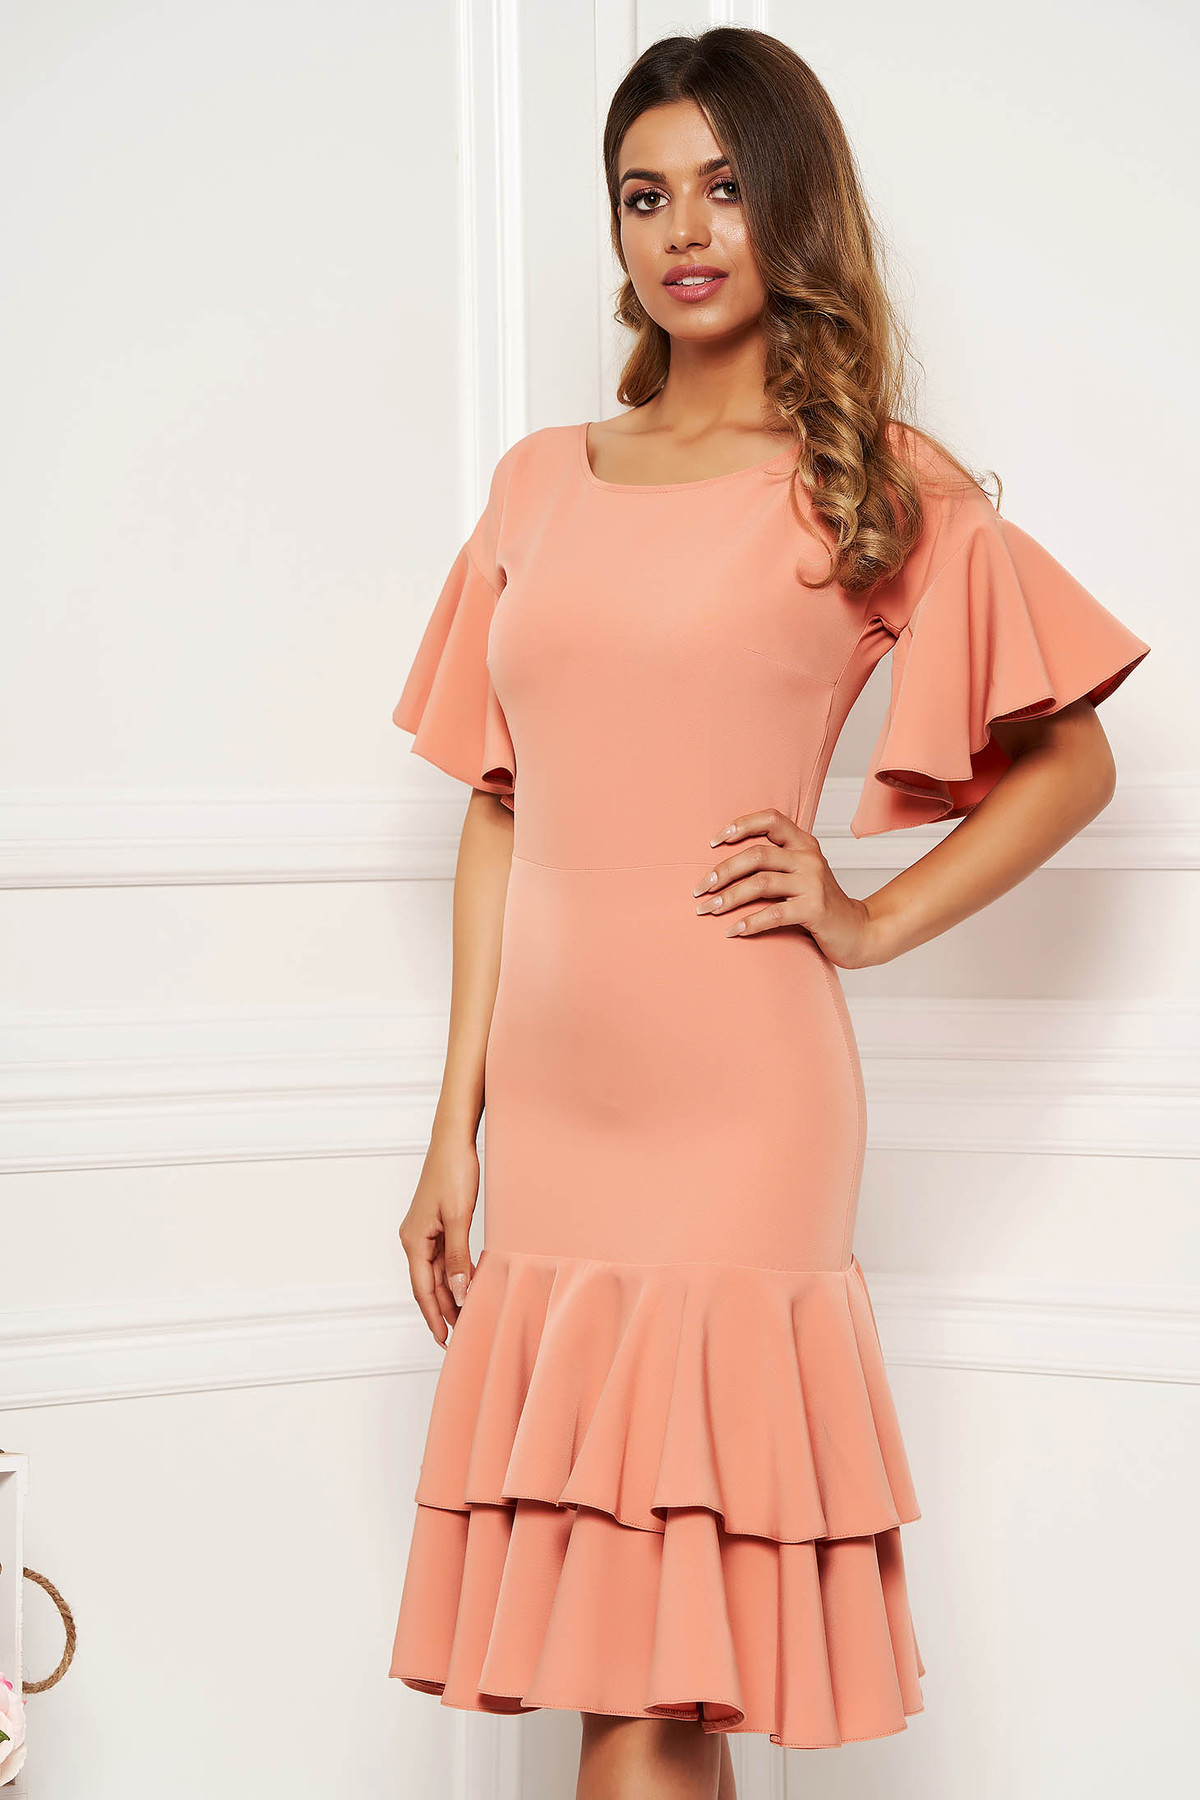 Rochie piersica eleganta midi cu maneci scurte din material usor elastic cu volanase la baza rochiei